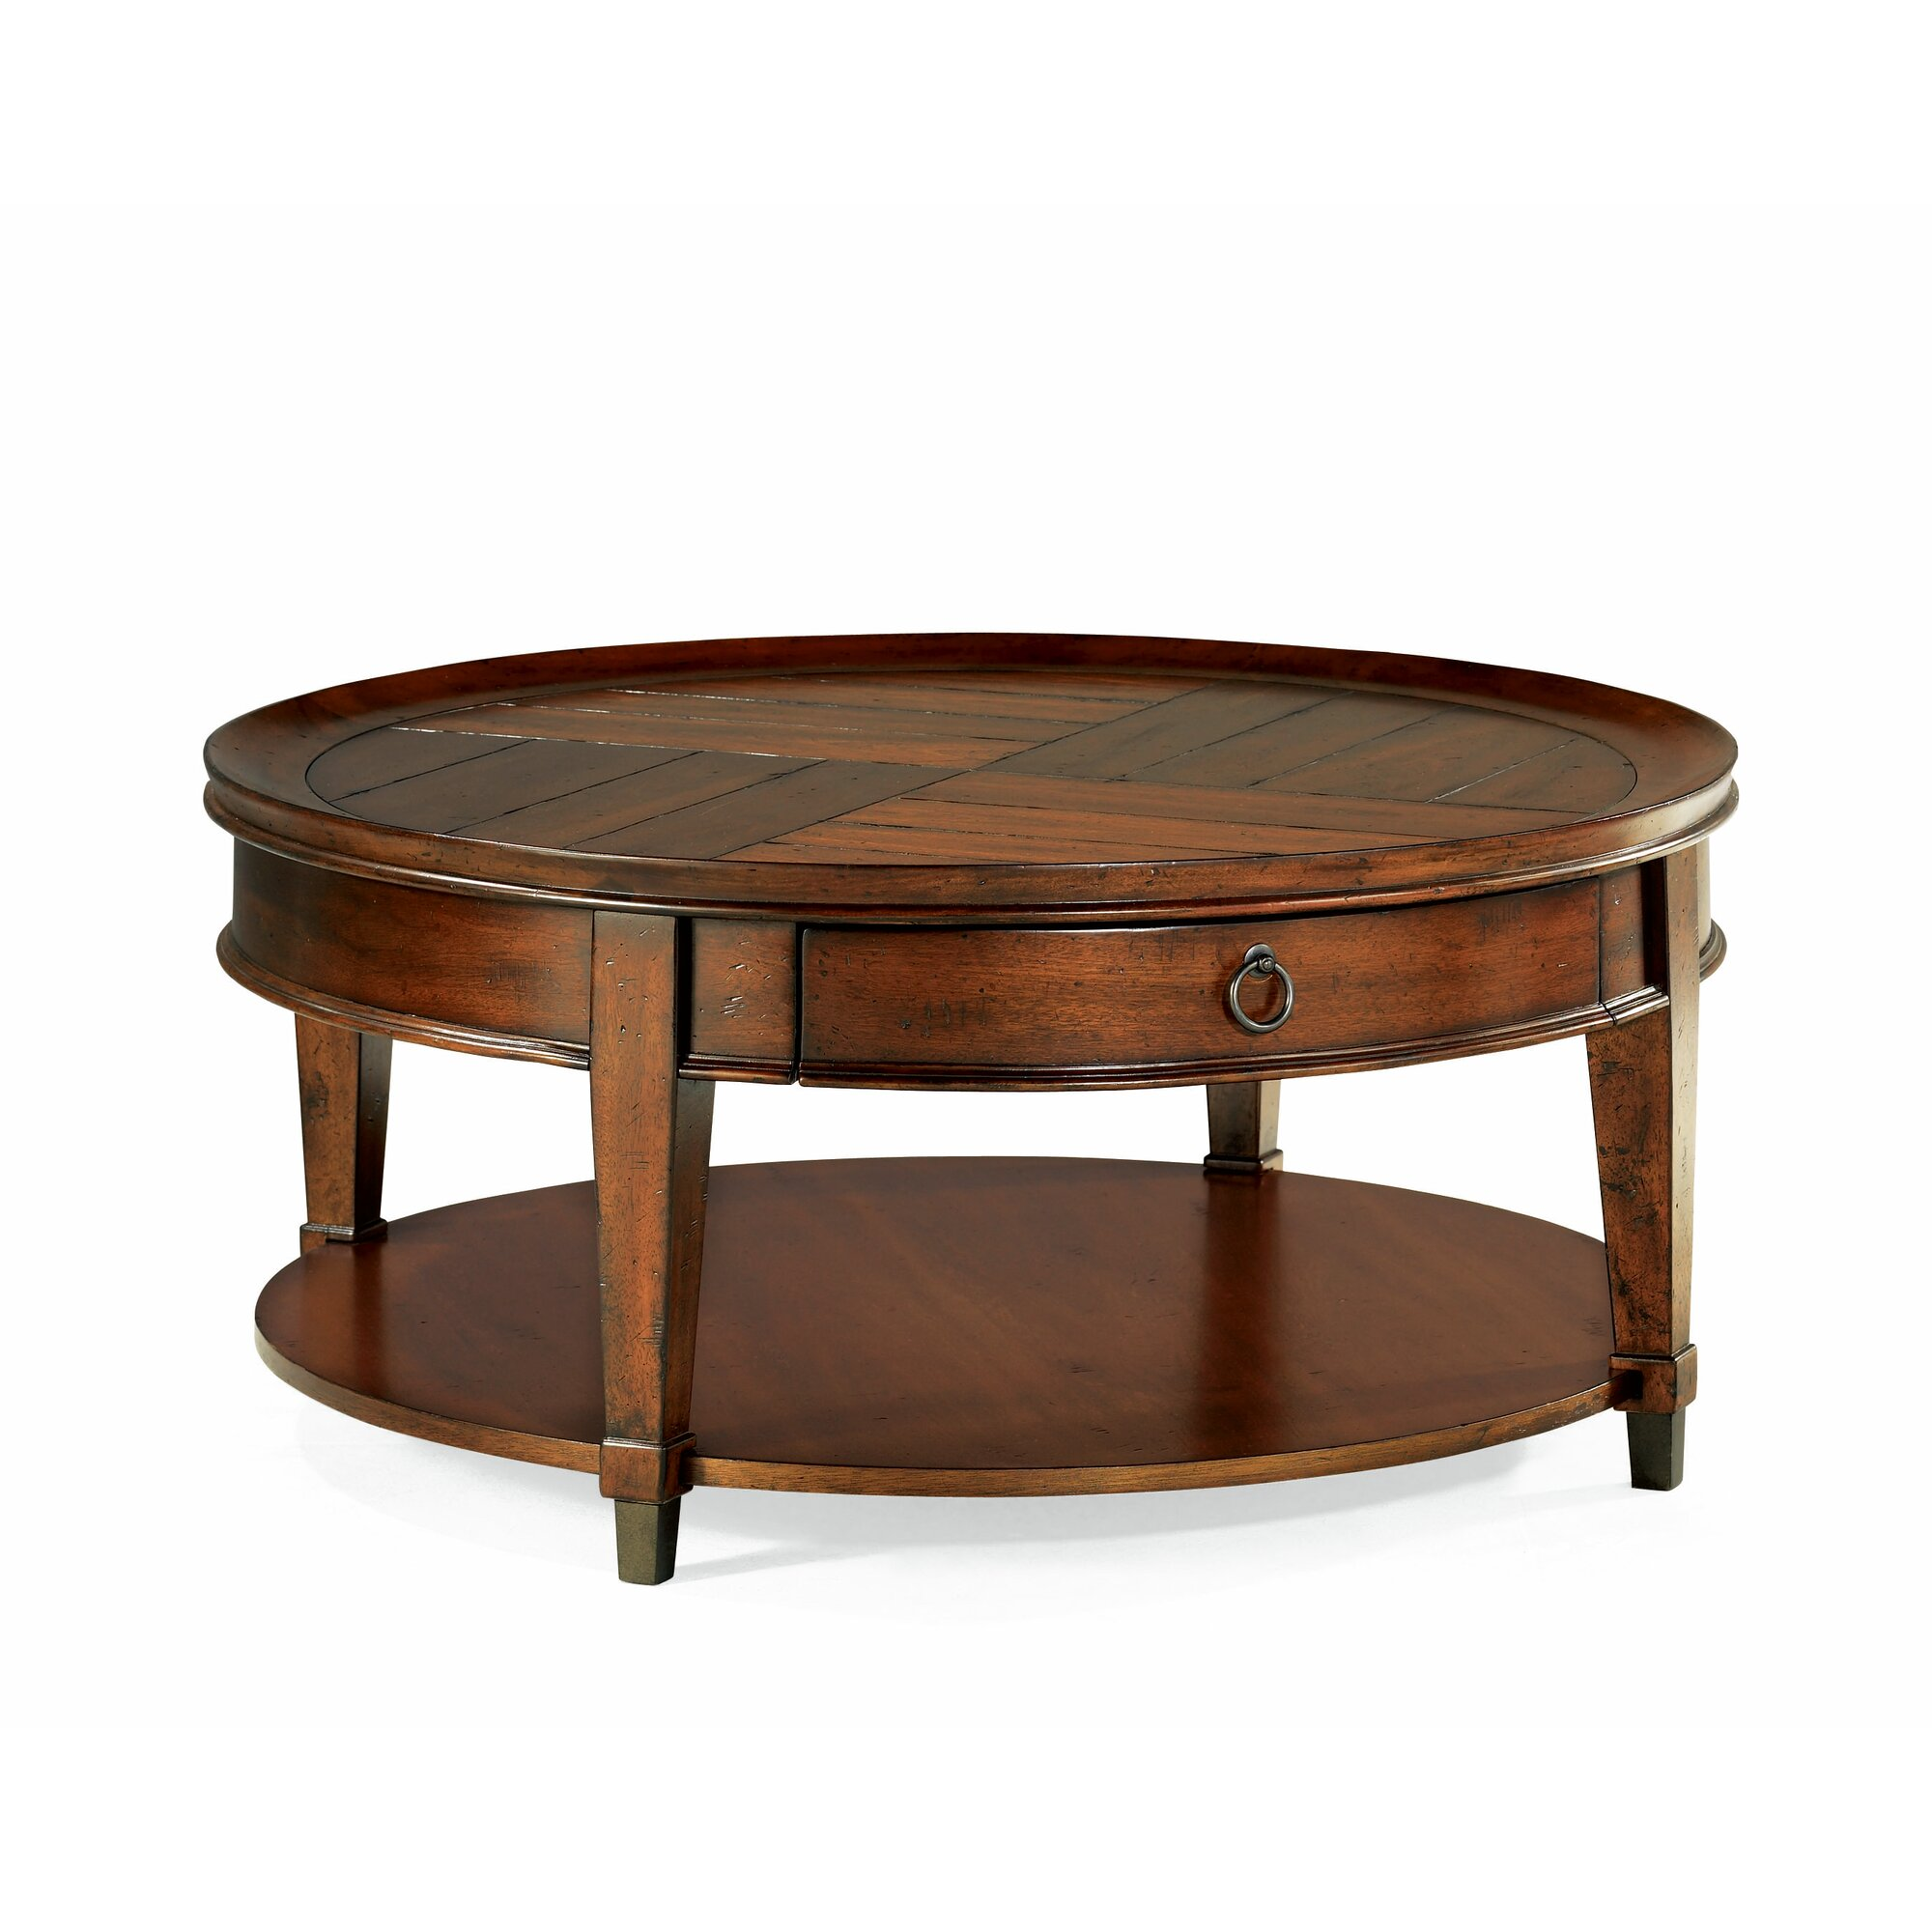 Darby Home Co Fitzhugh Coffee Table & Reviews   Wayfair